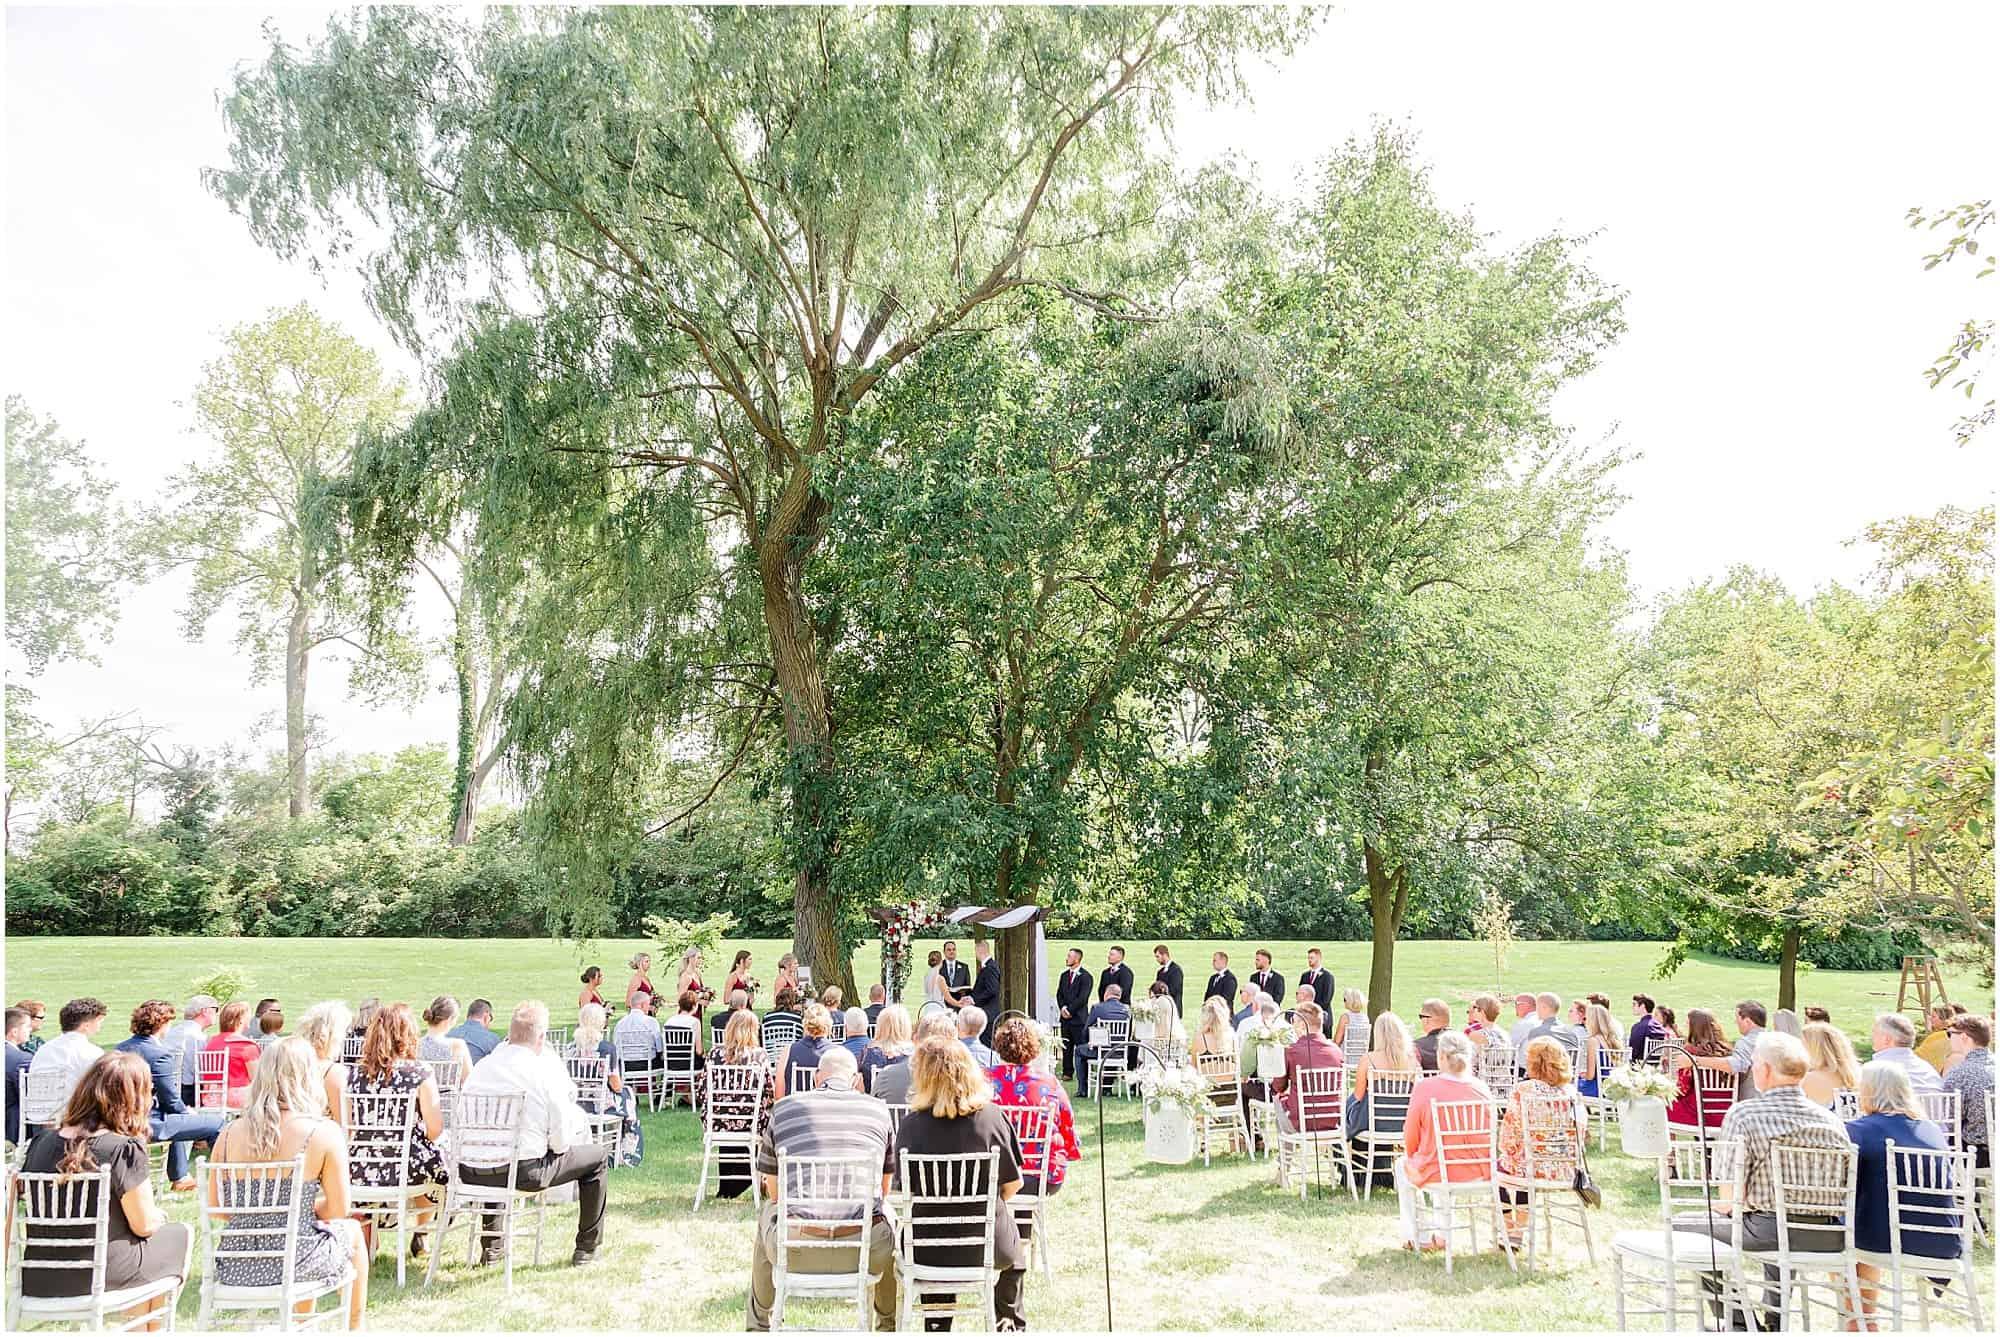 millsite lodge wedding ceremony by tiffany murray